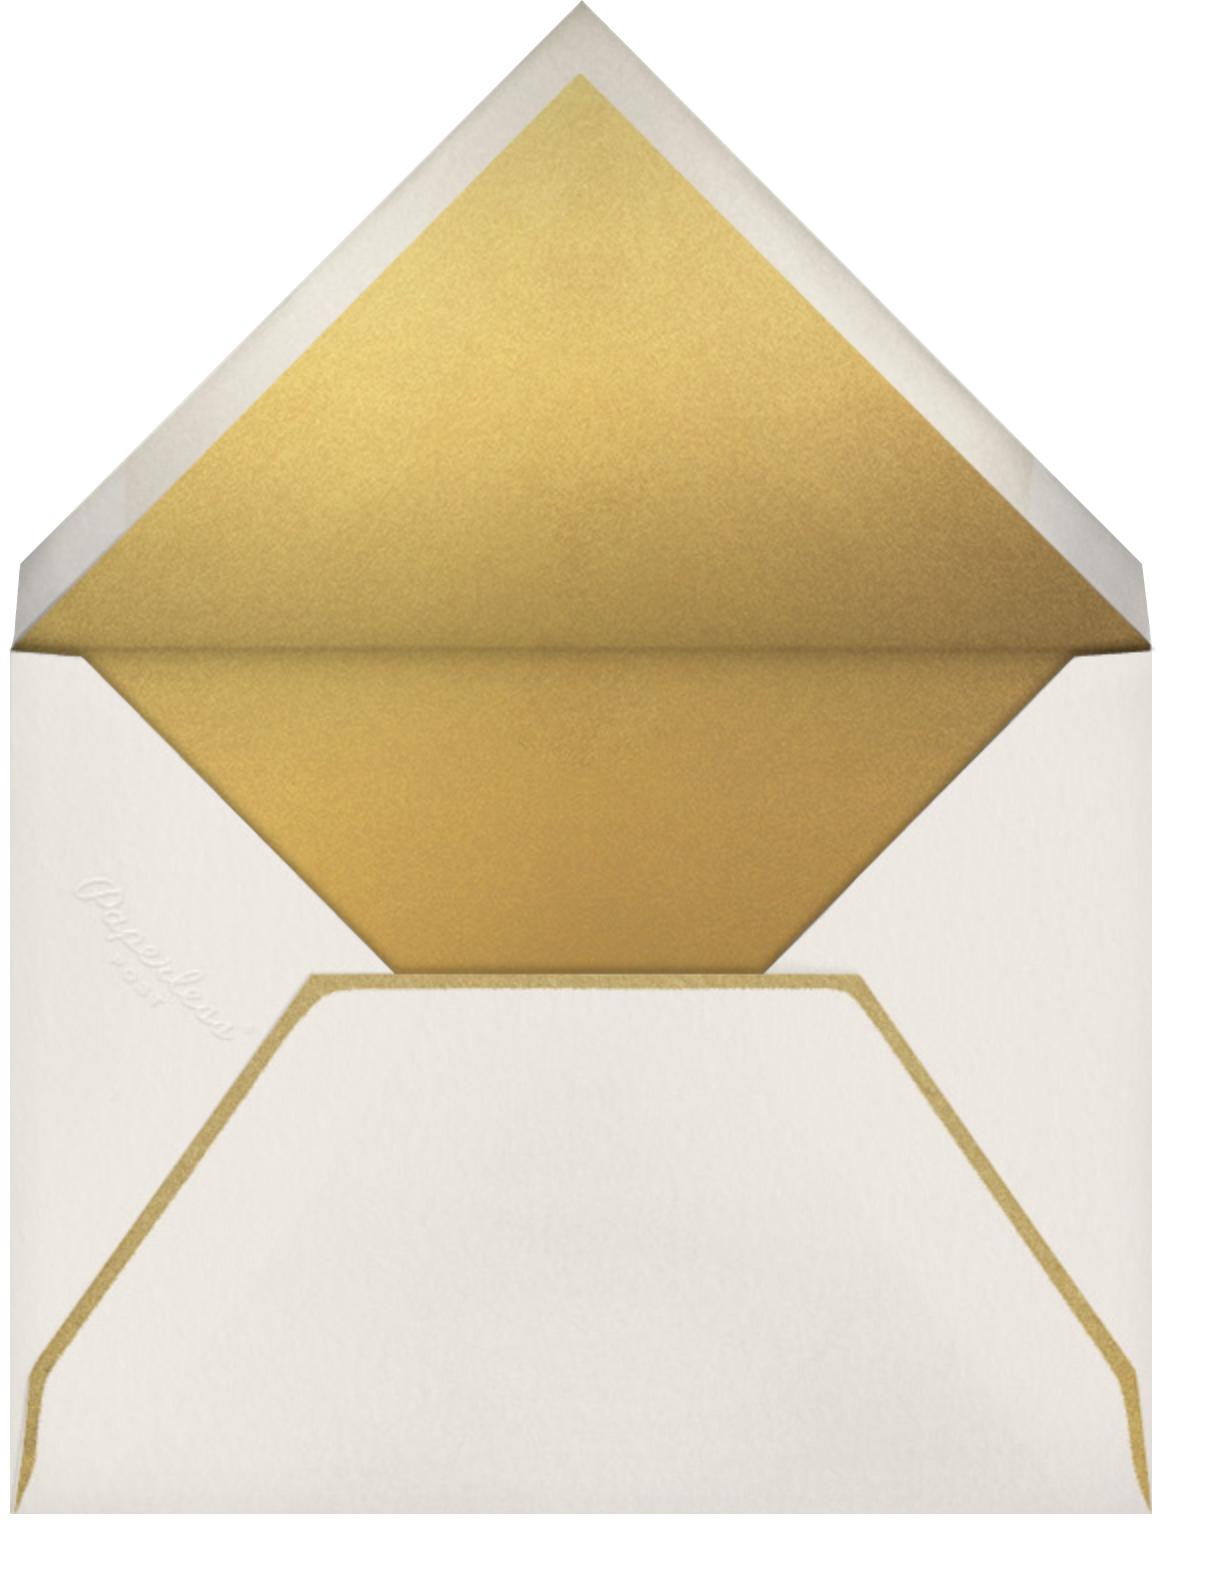 Shofar - Paperless Post - Envelope